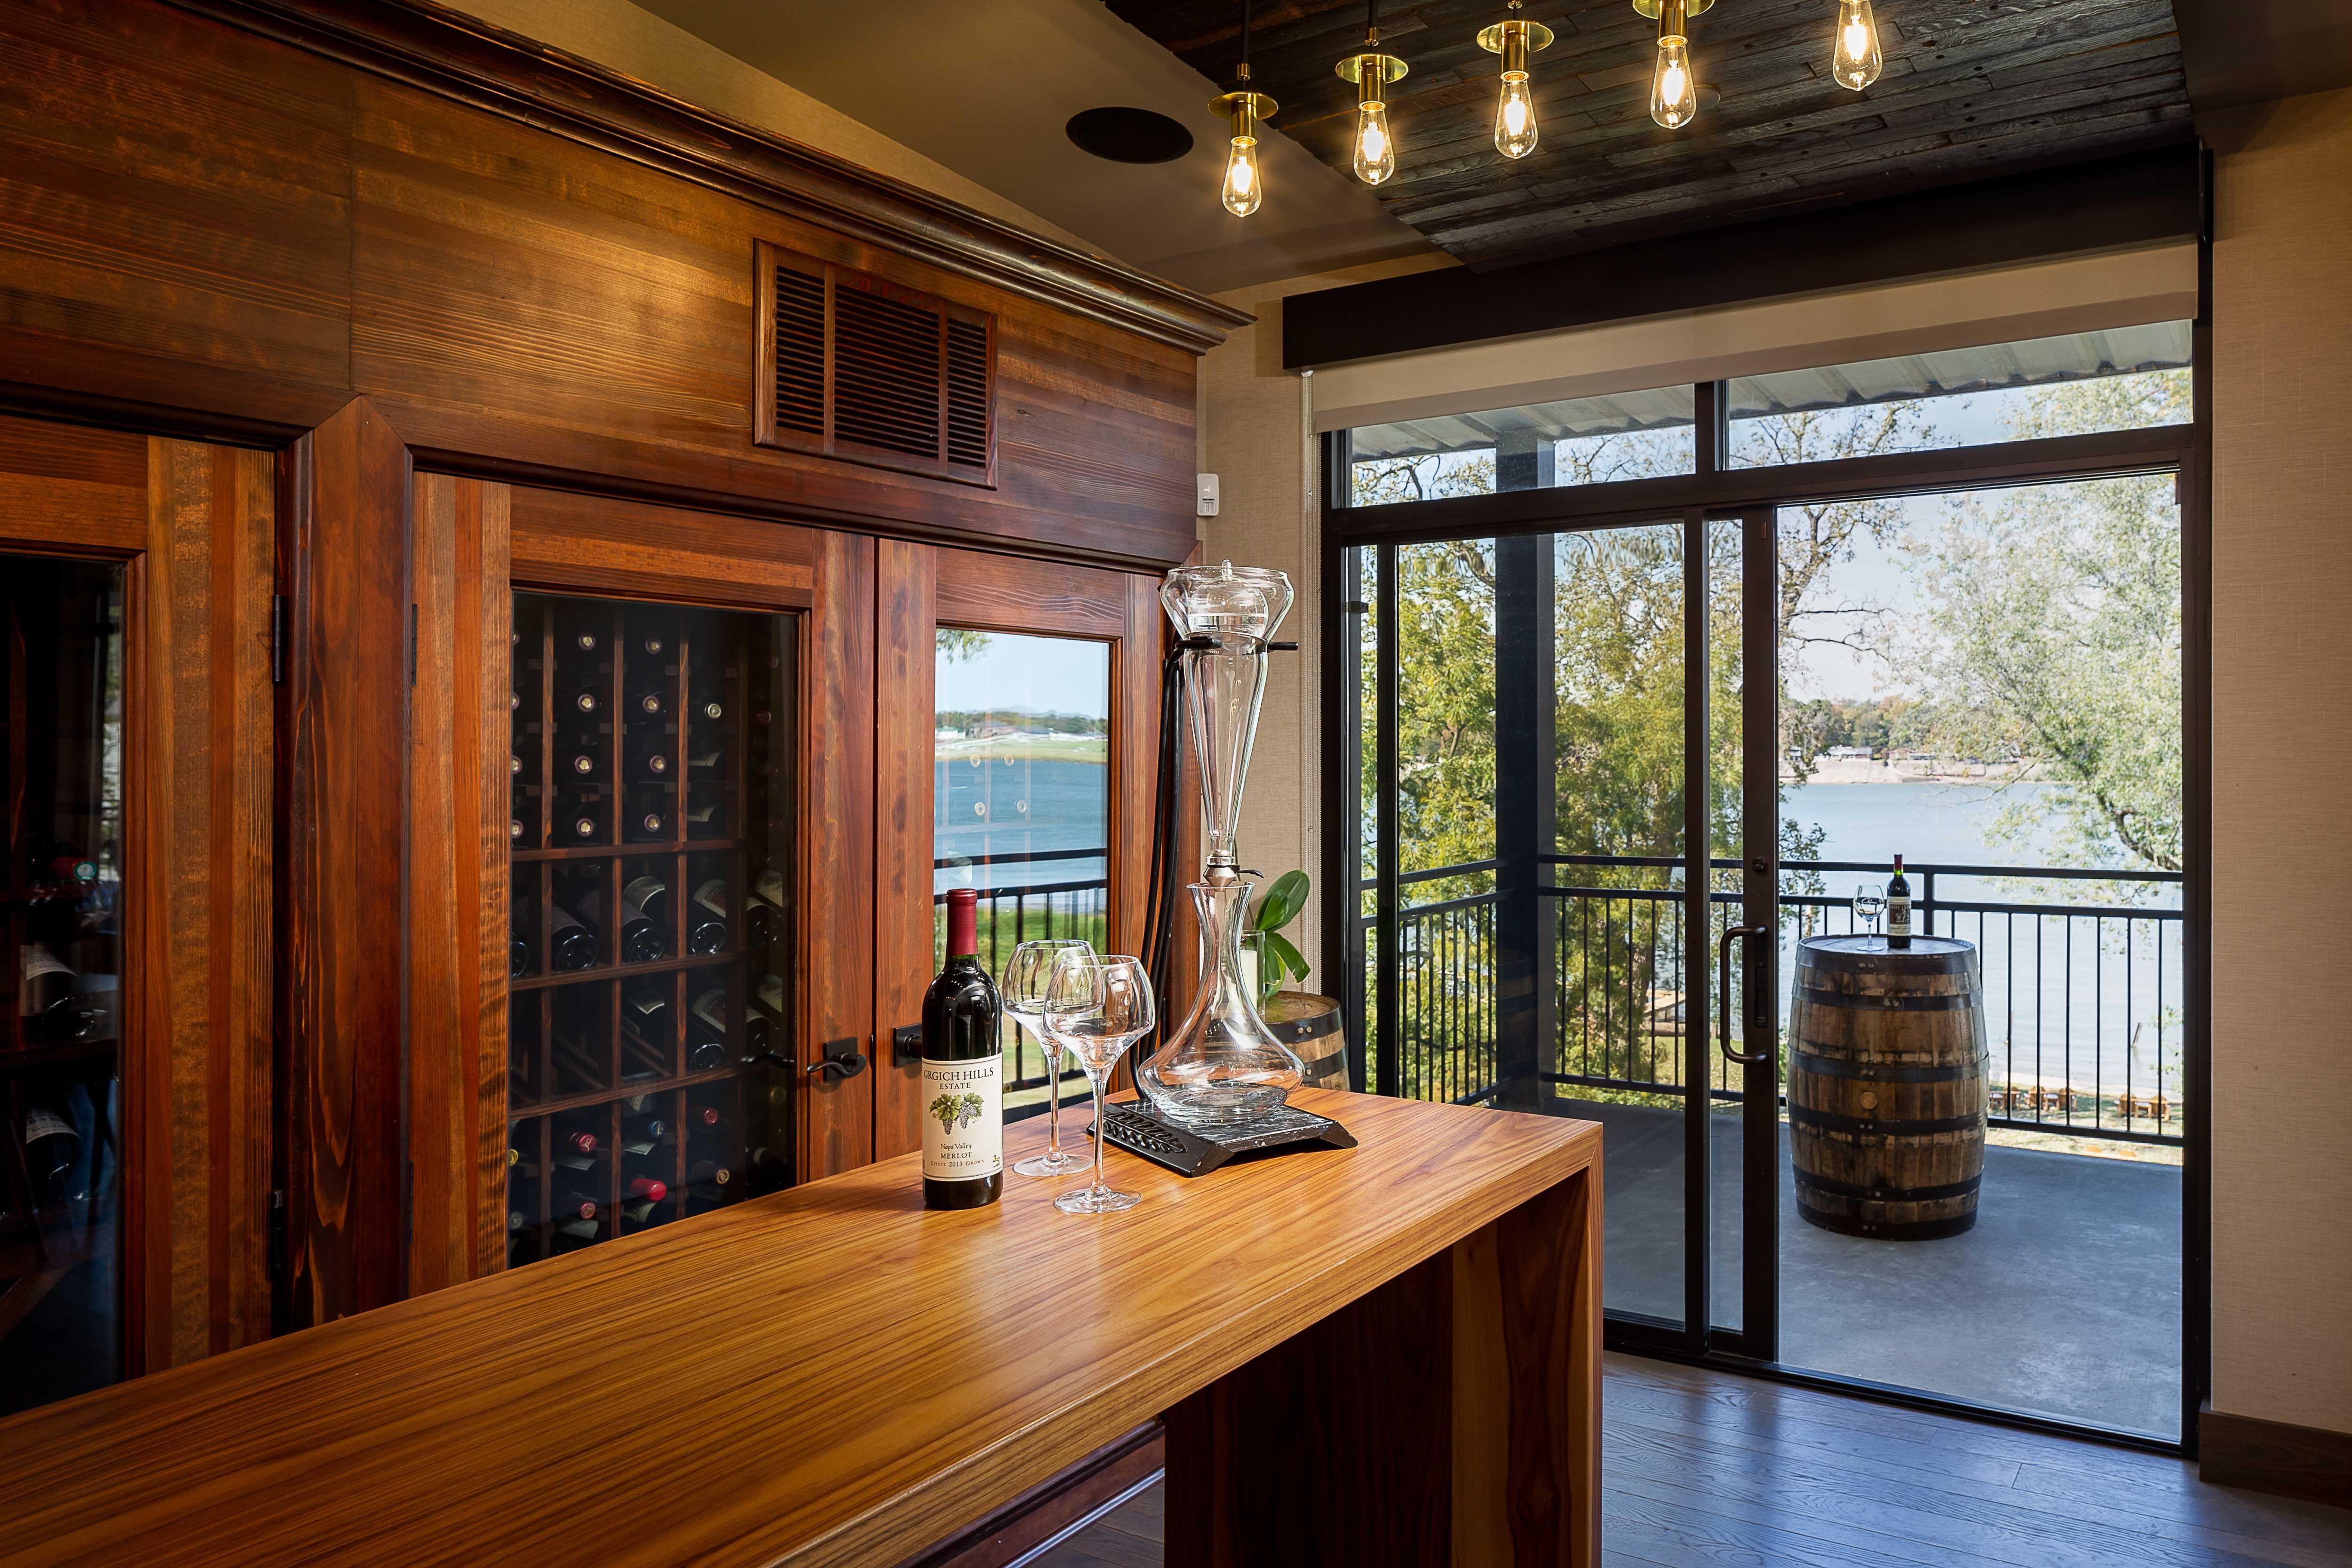 savor-river-house-tasting-room